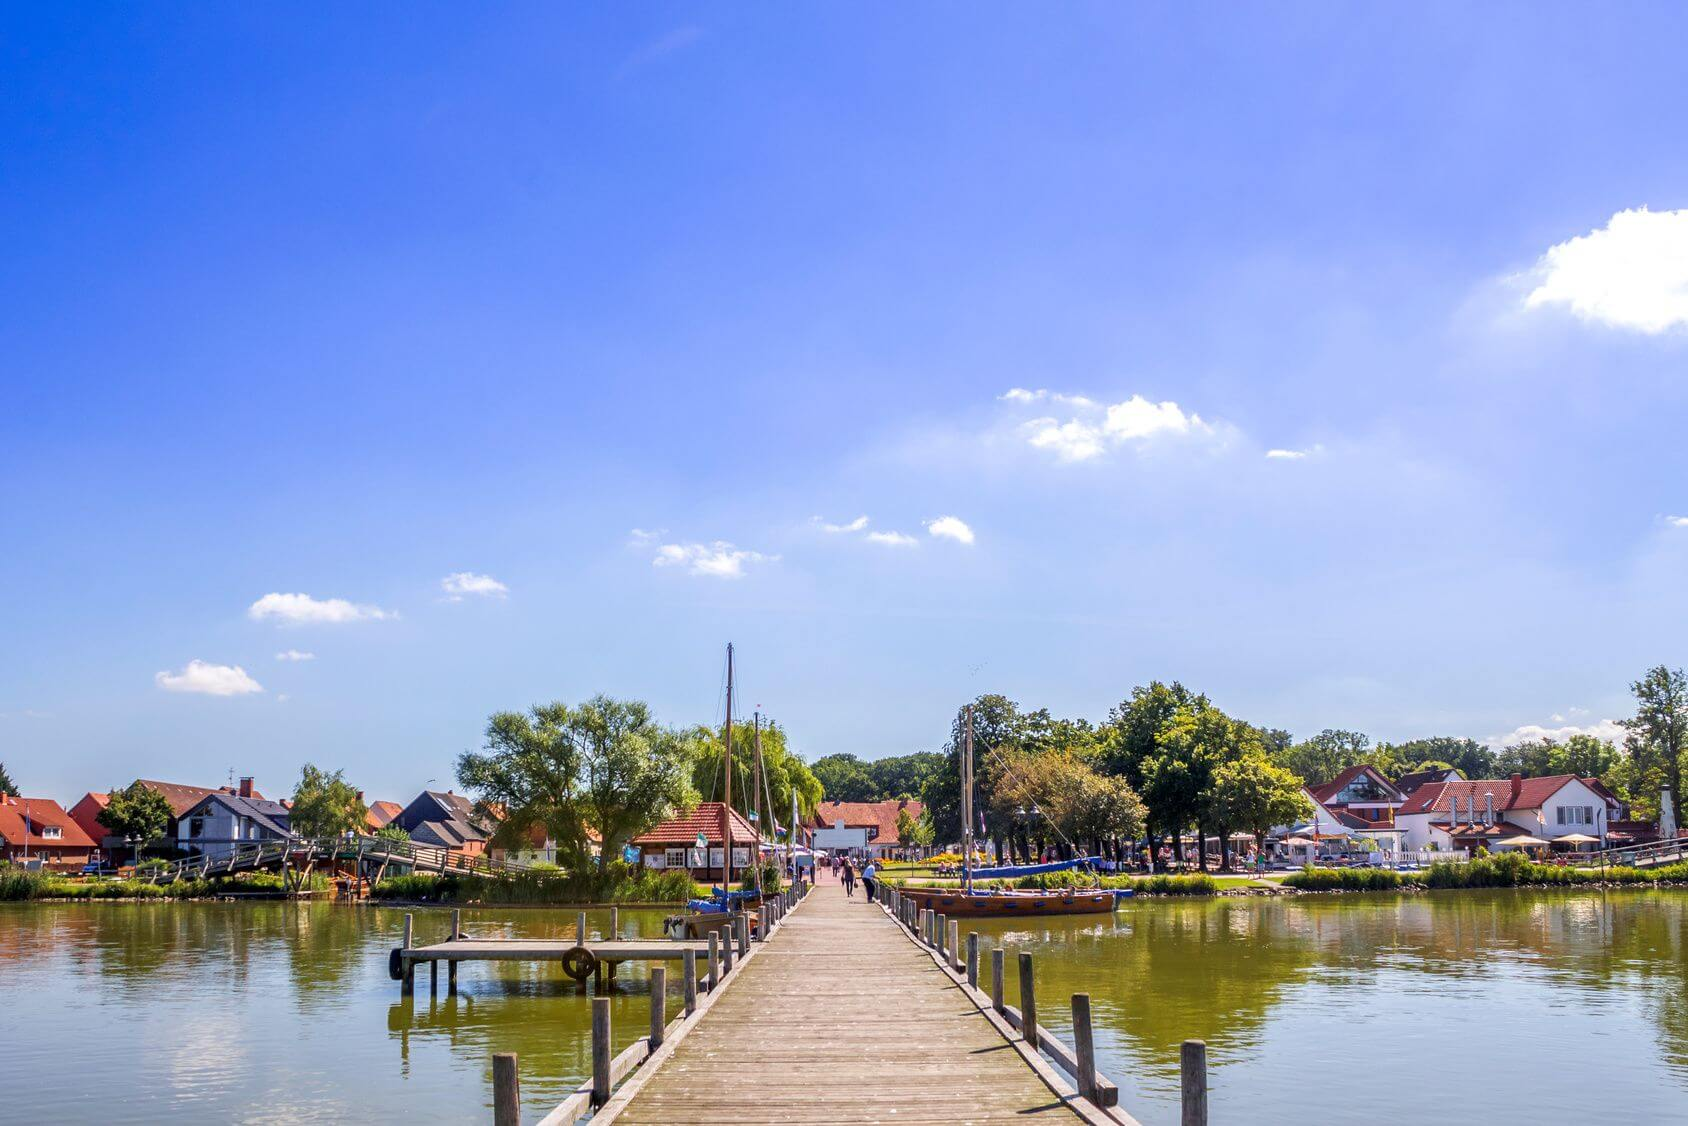 Südufer Blick auf Promenade